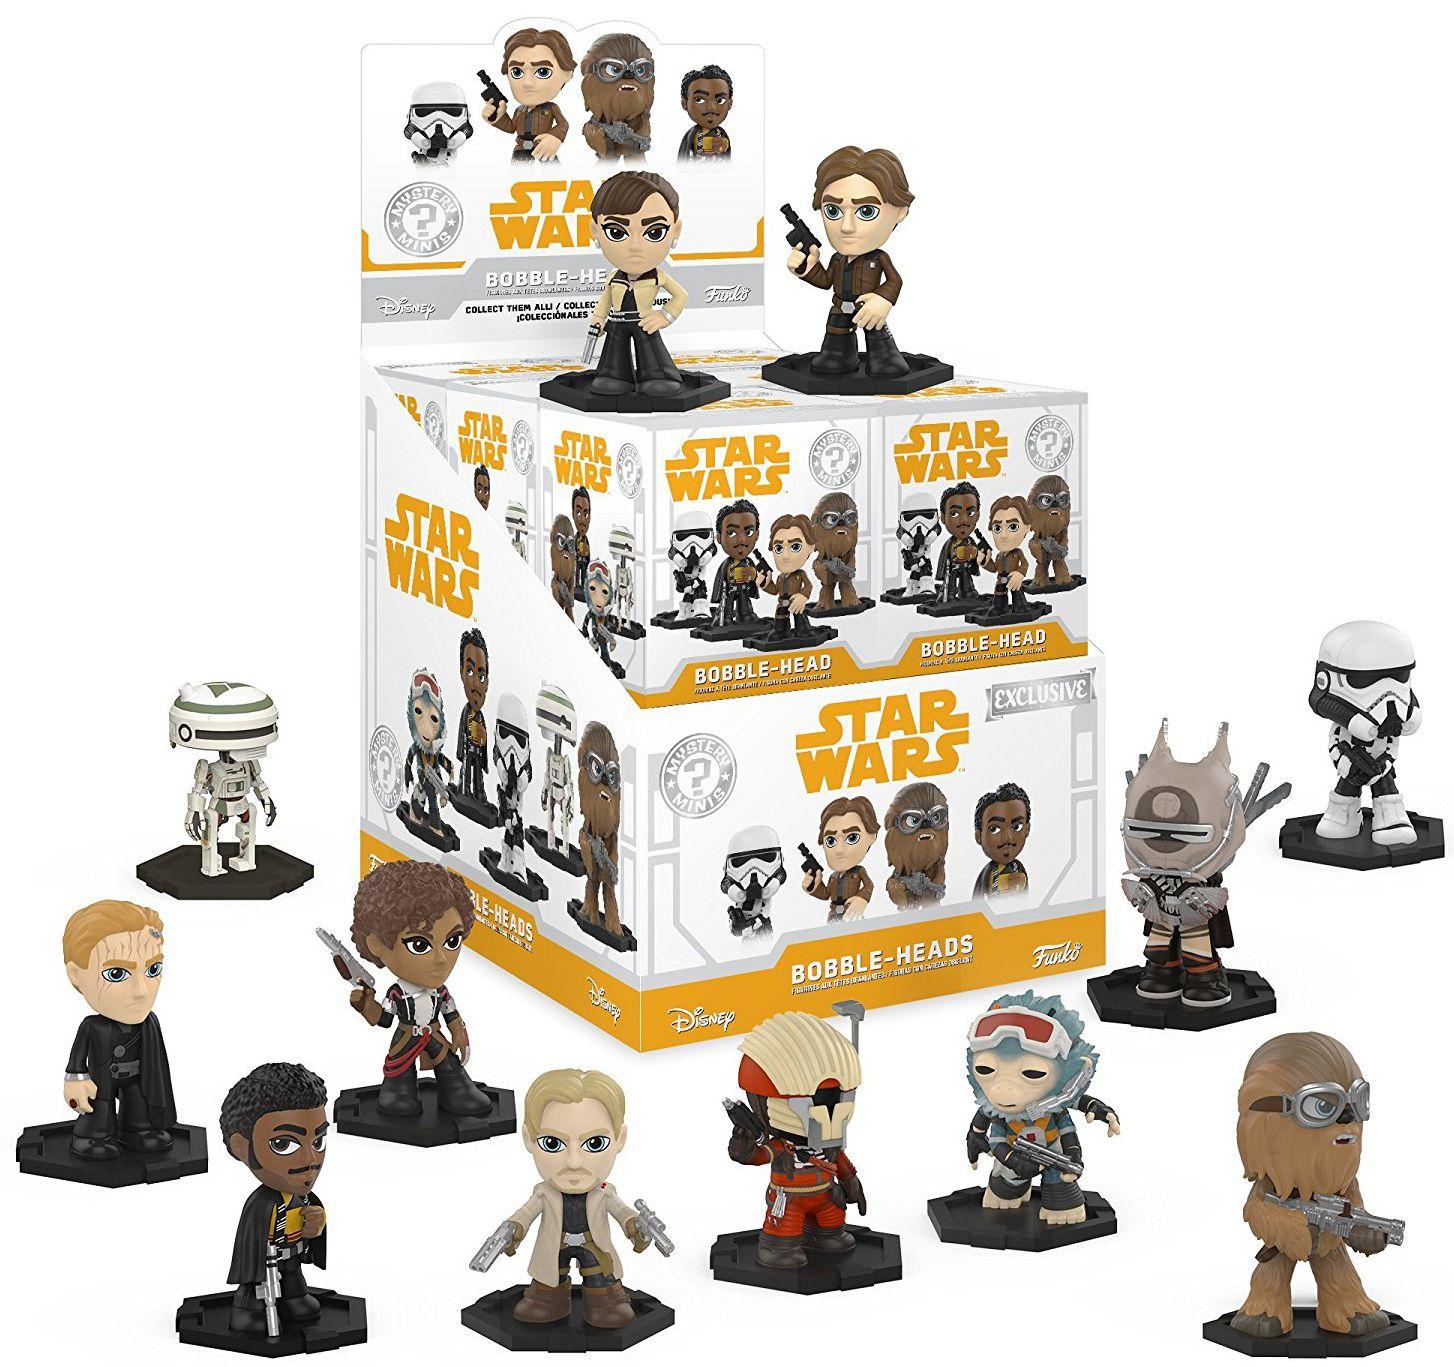 Мини фигура Funko: Star Wars: Solo Series 1 - Mystery Mini Blind Box - 1